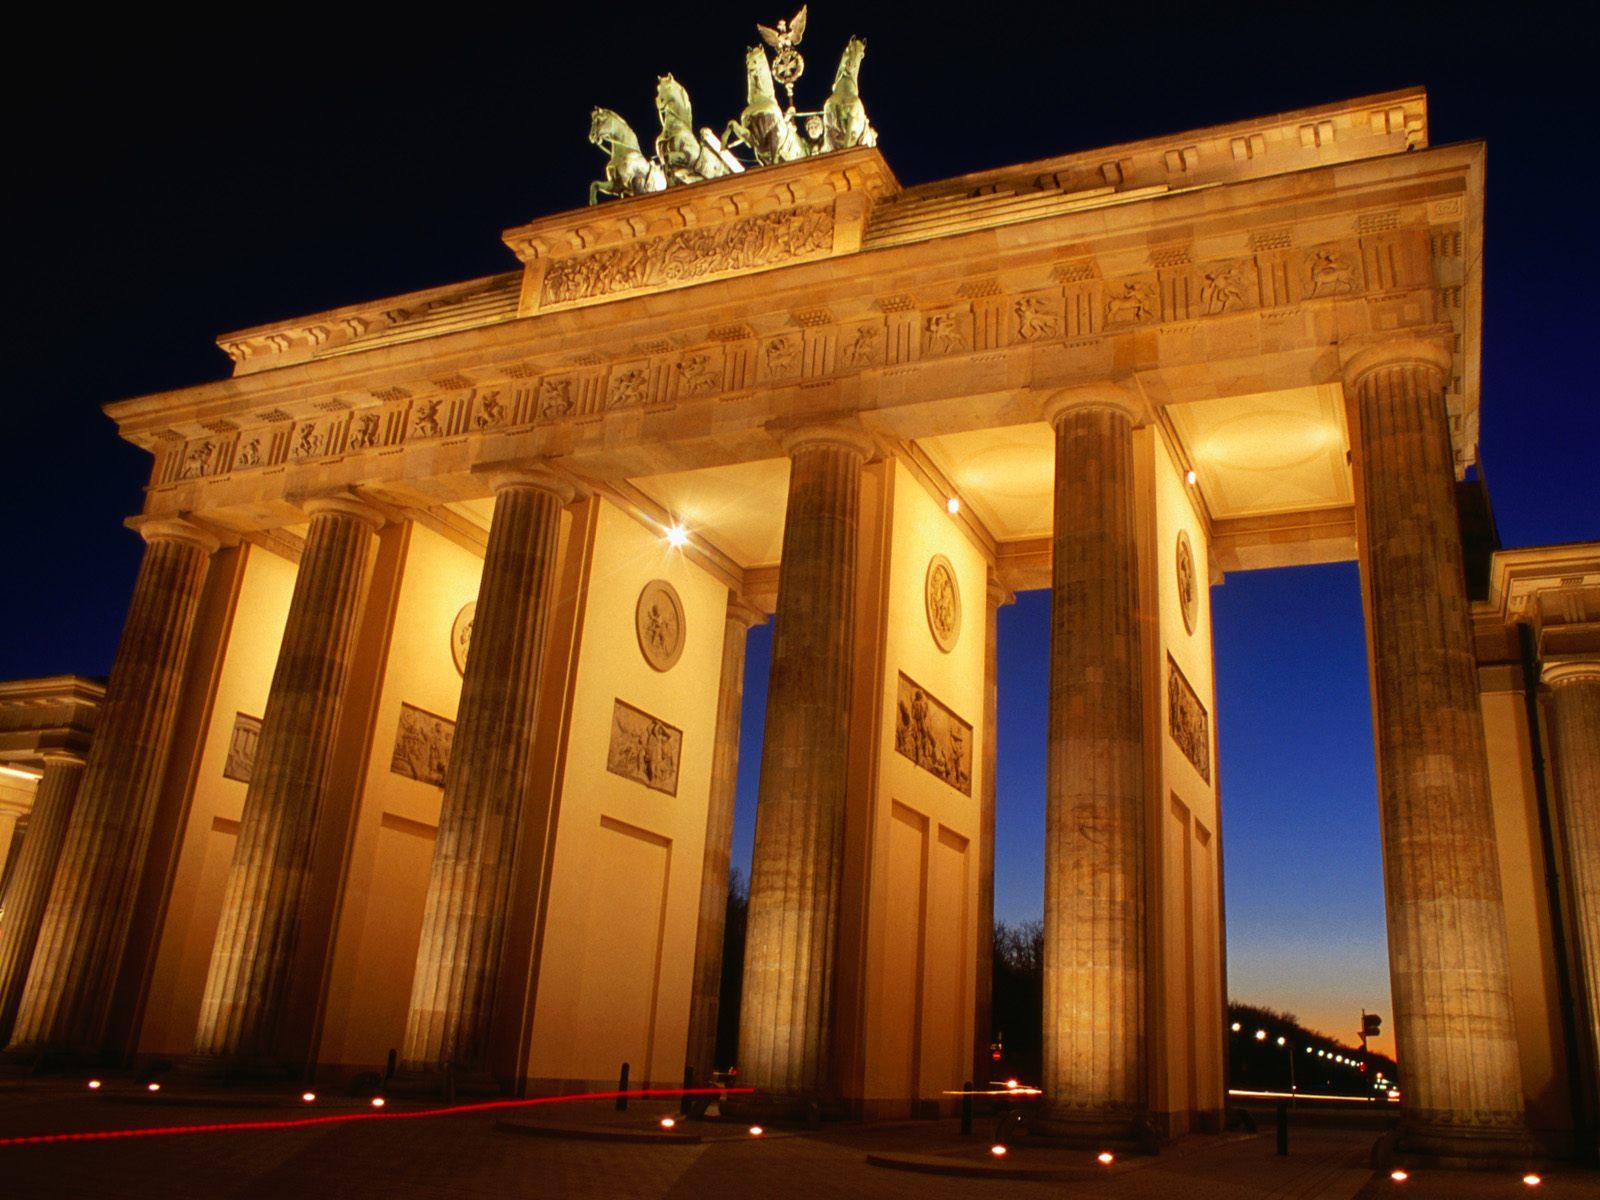 http://4.bp.blogspot.com/__EiwQgMrUn0/TEFHRdrremI/AAAAAAAAAD0/z-dm6kuBJCU/s1600/Brandenburg_Gate_at_Dusk_Berlin_Germany.jpg